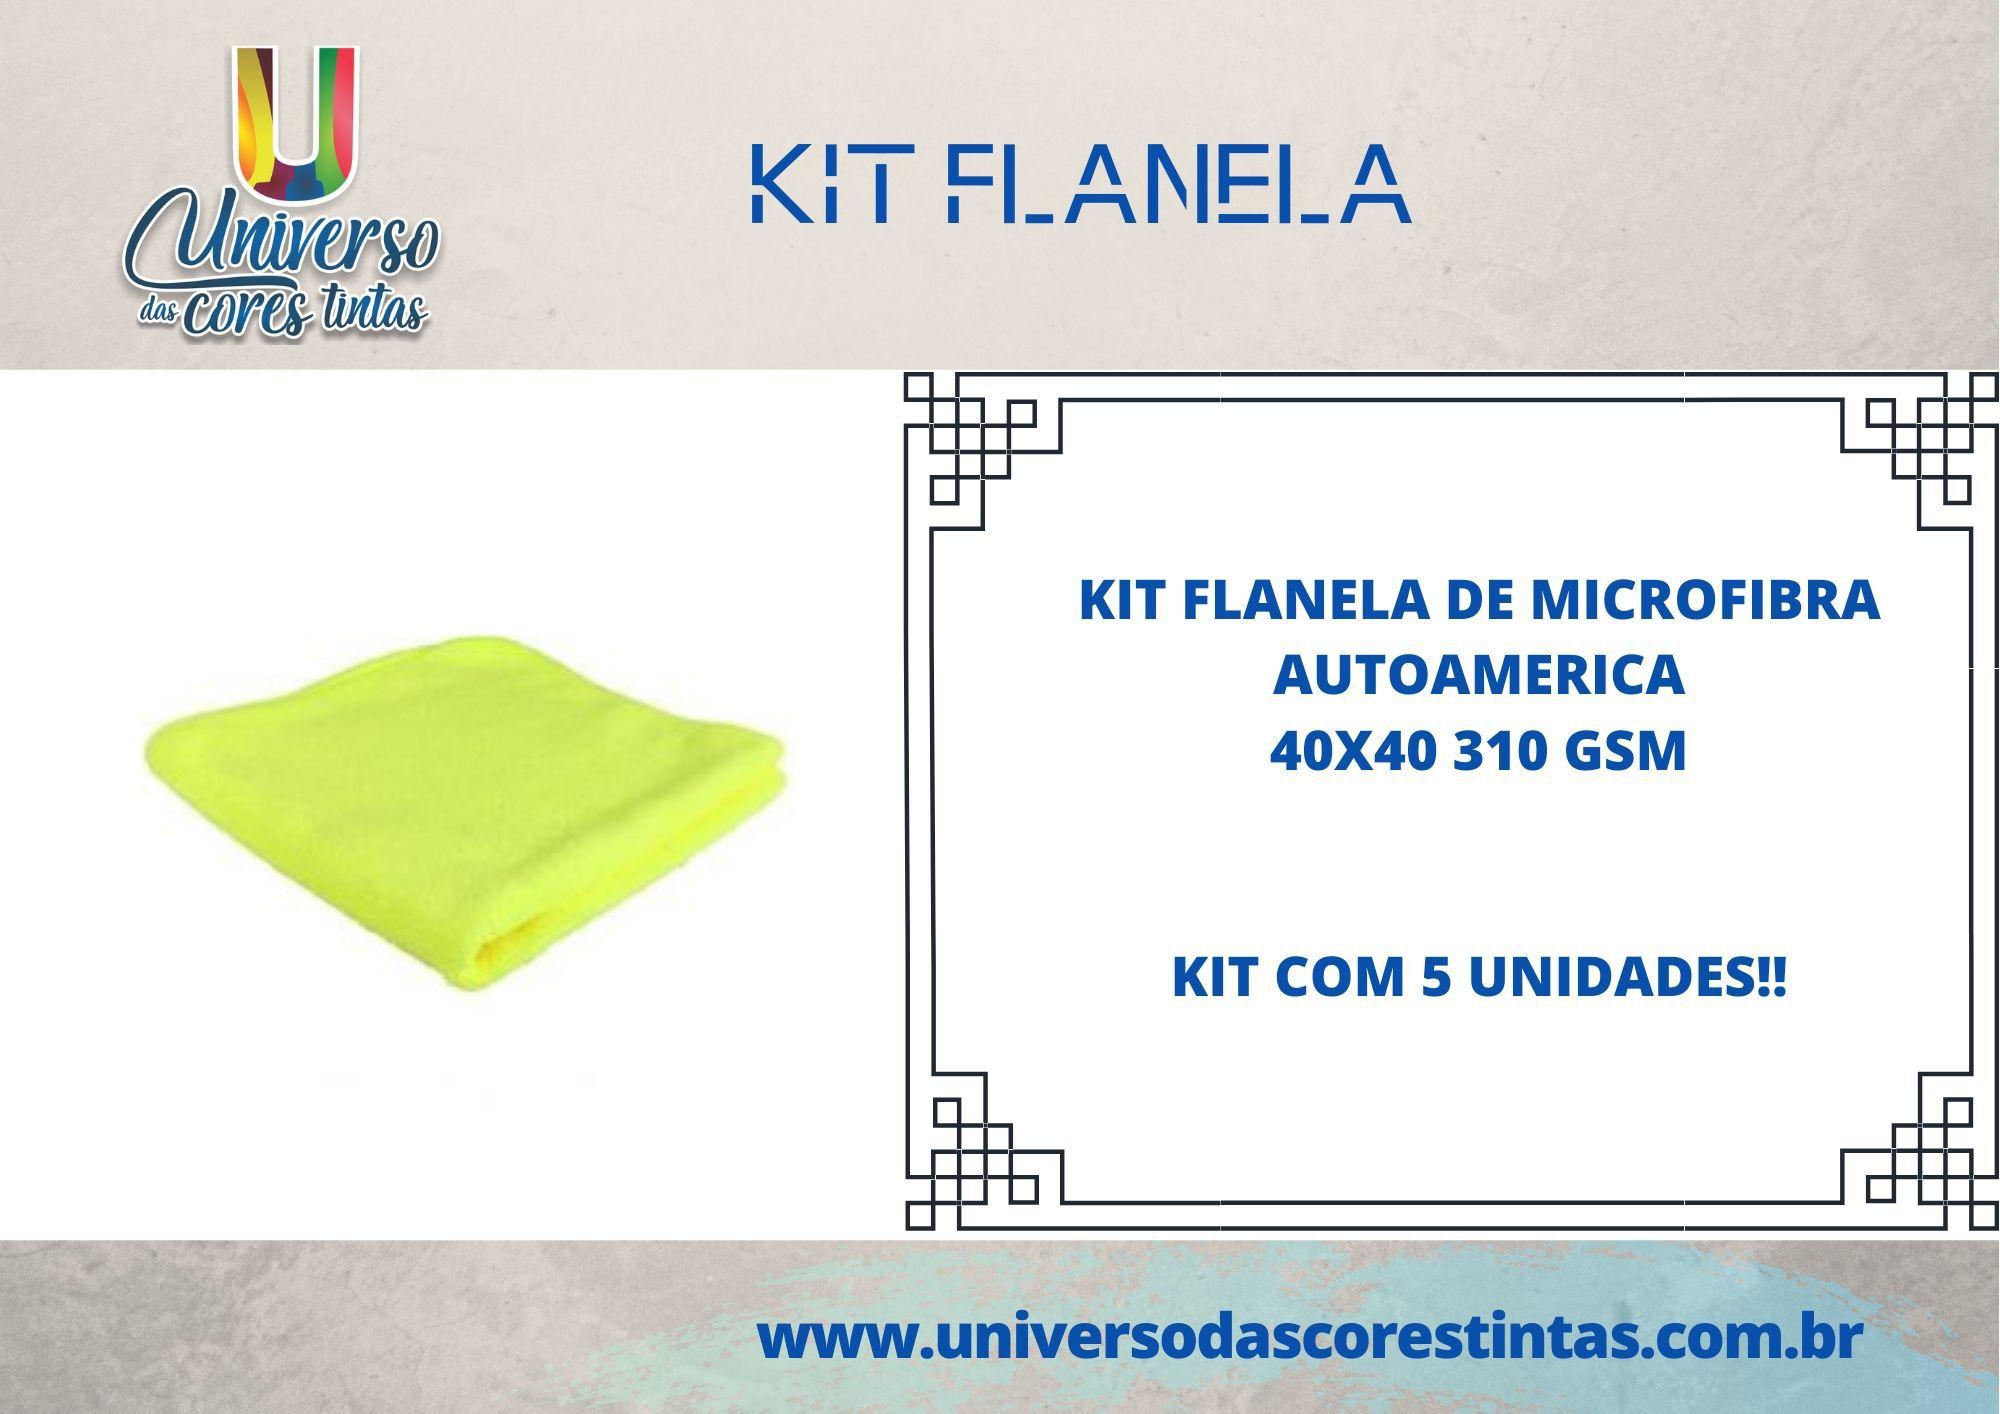 Kit de Flanela de Microfibra 40x40 310 GSM Autoamerica (5 Unidades)